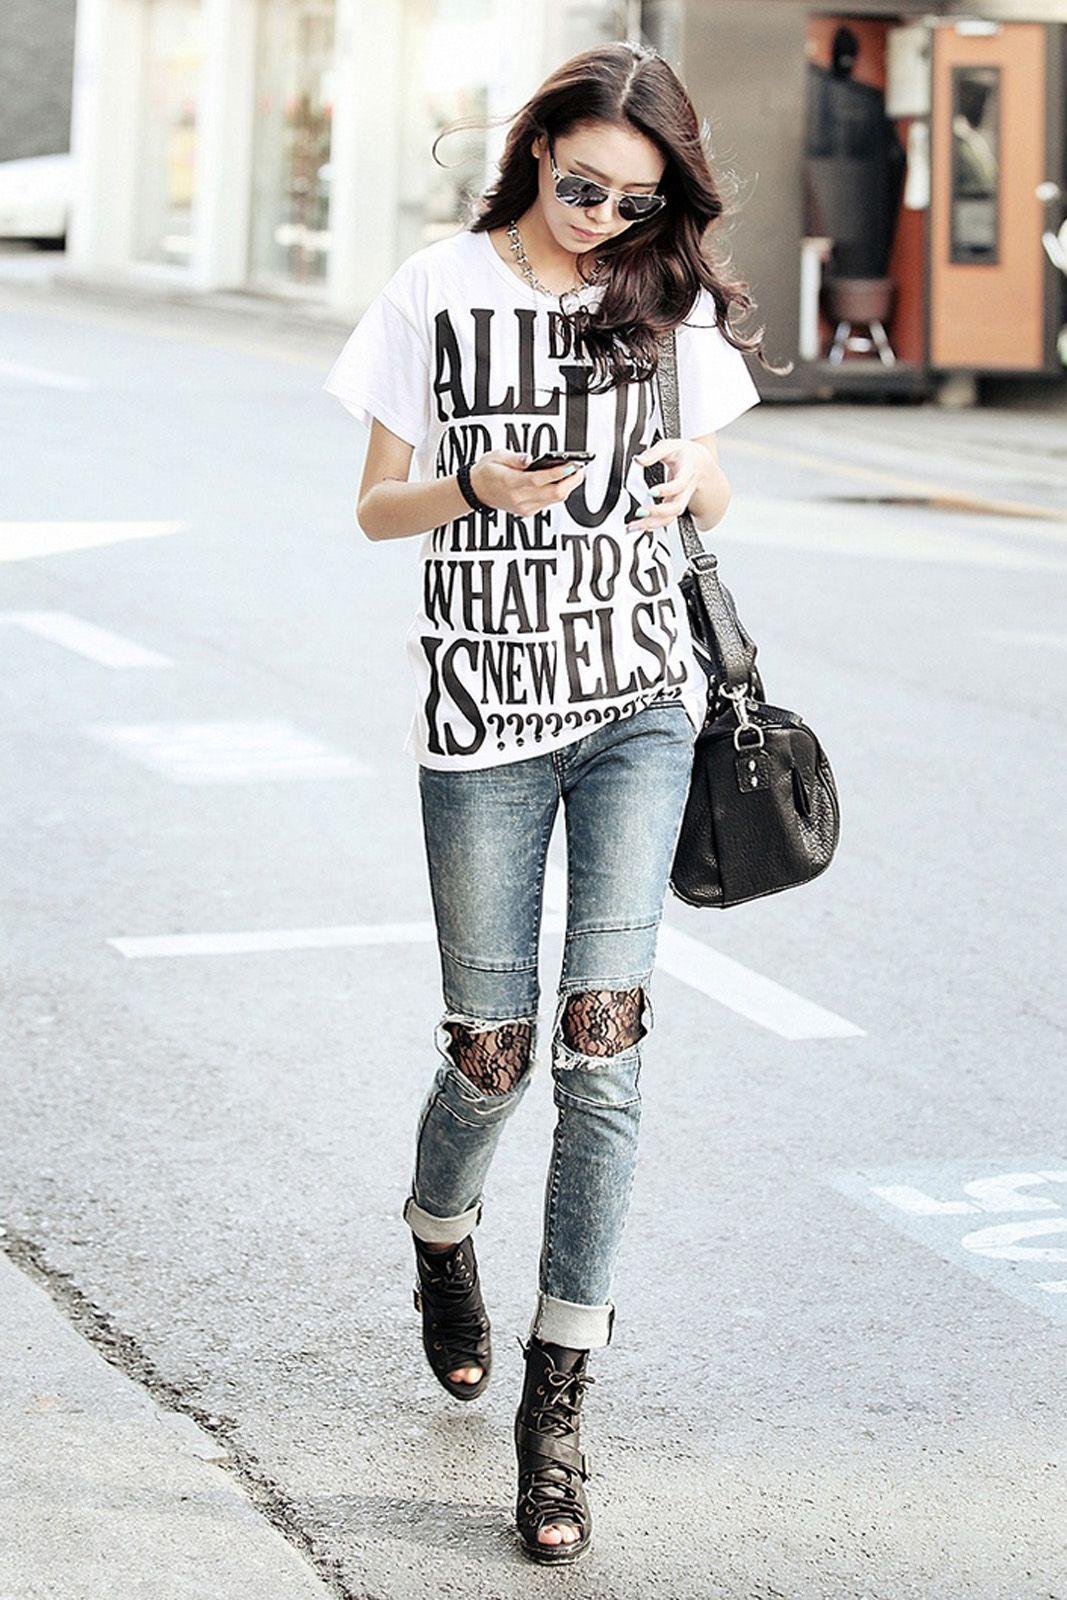 Buat Gayamu Semakin Keren dengan Mix n Match Graphic T-shirt Berikut Ini!